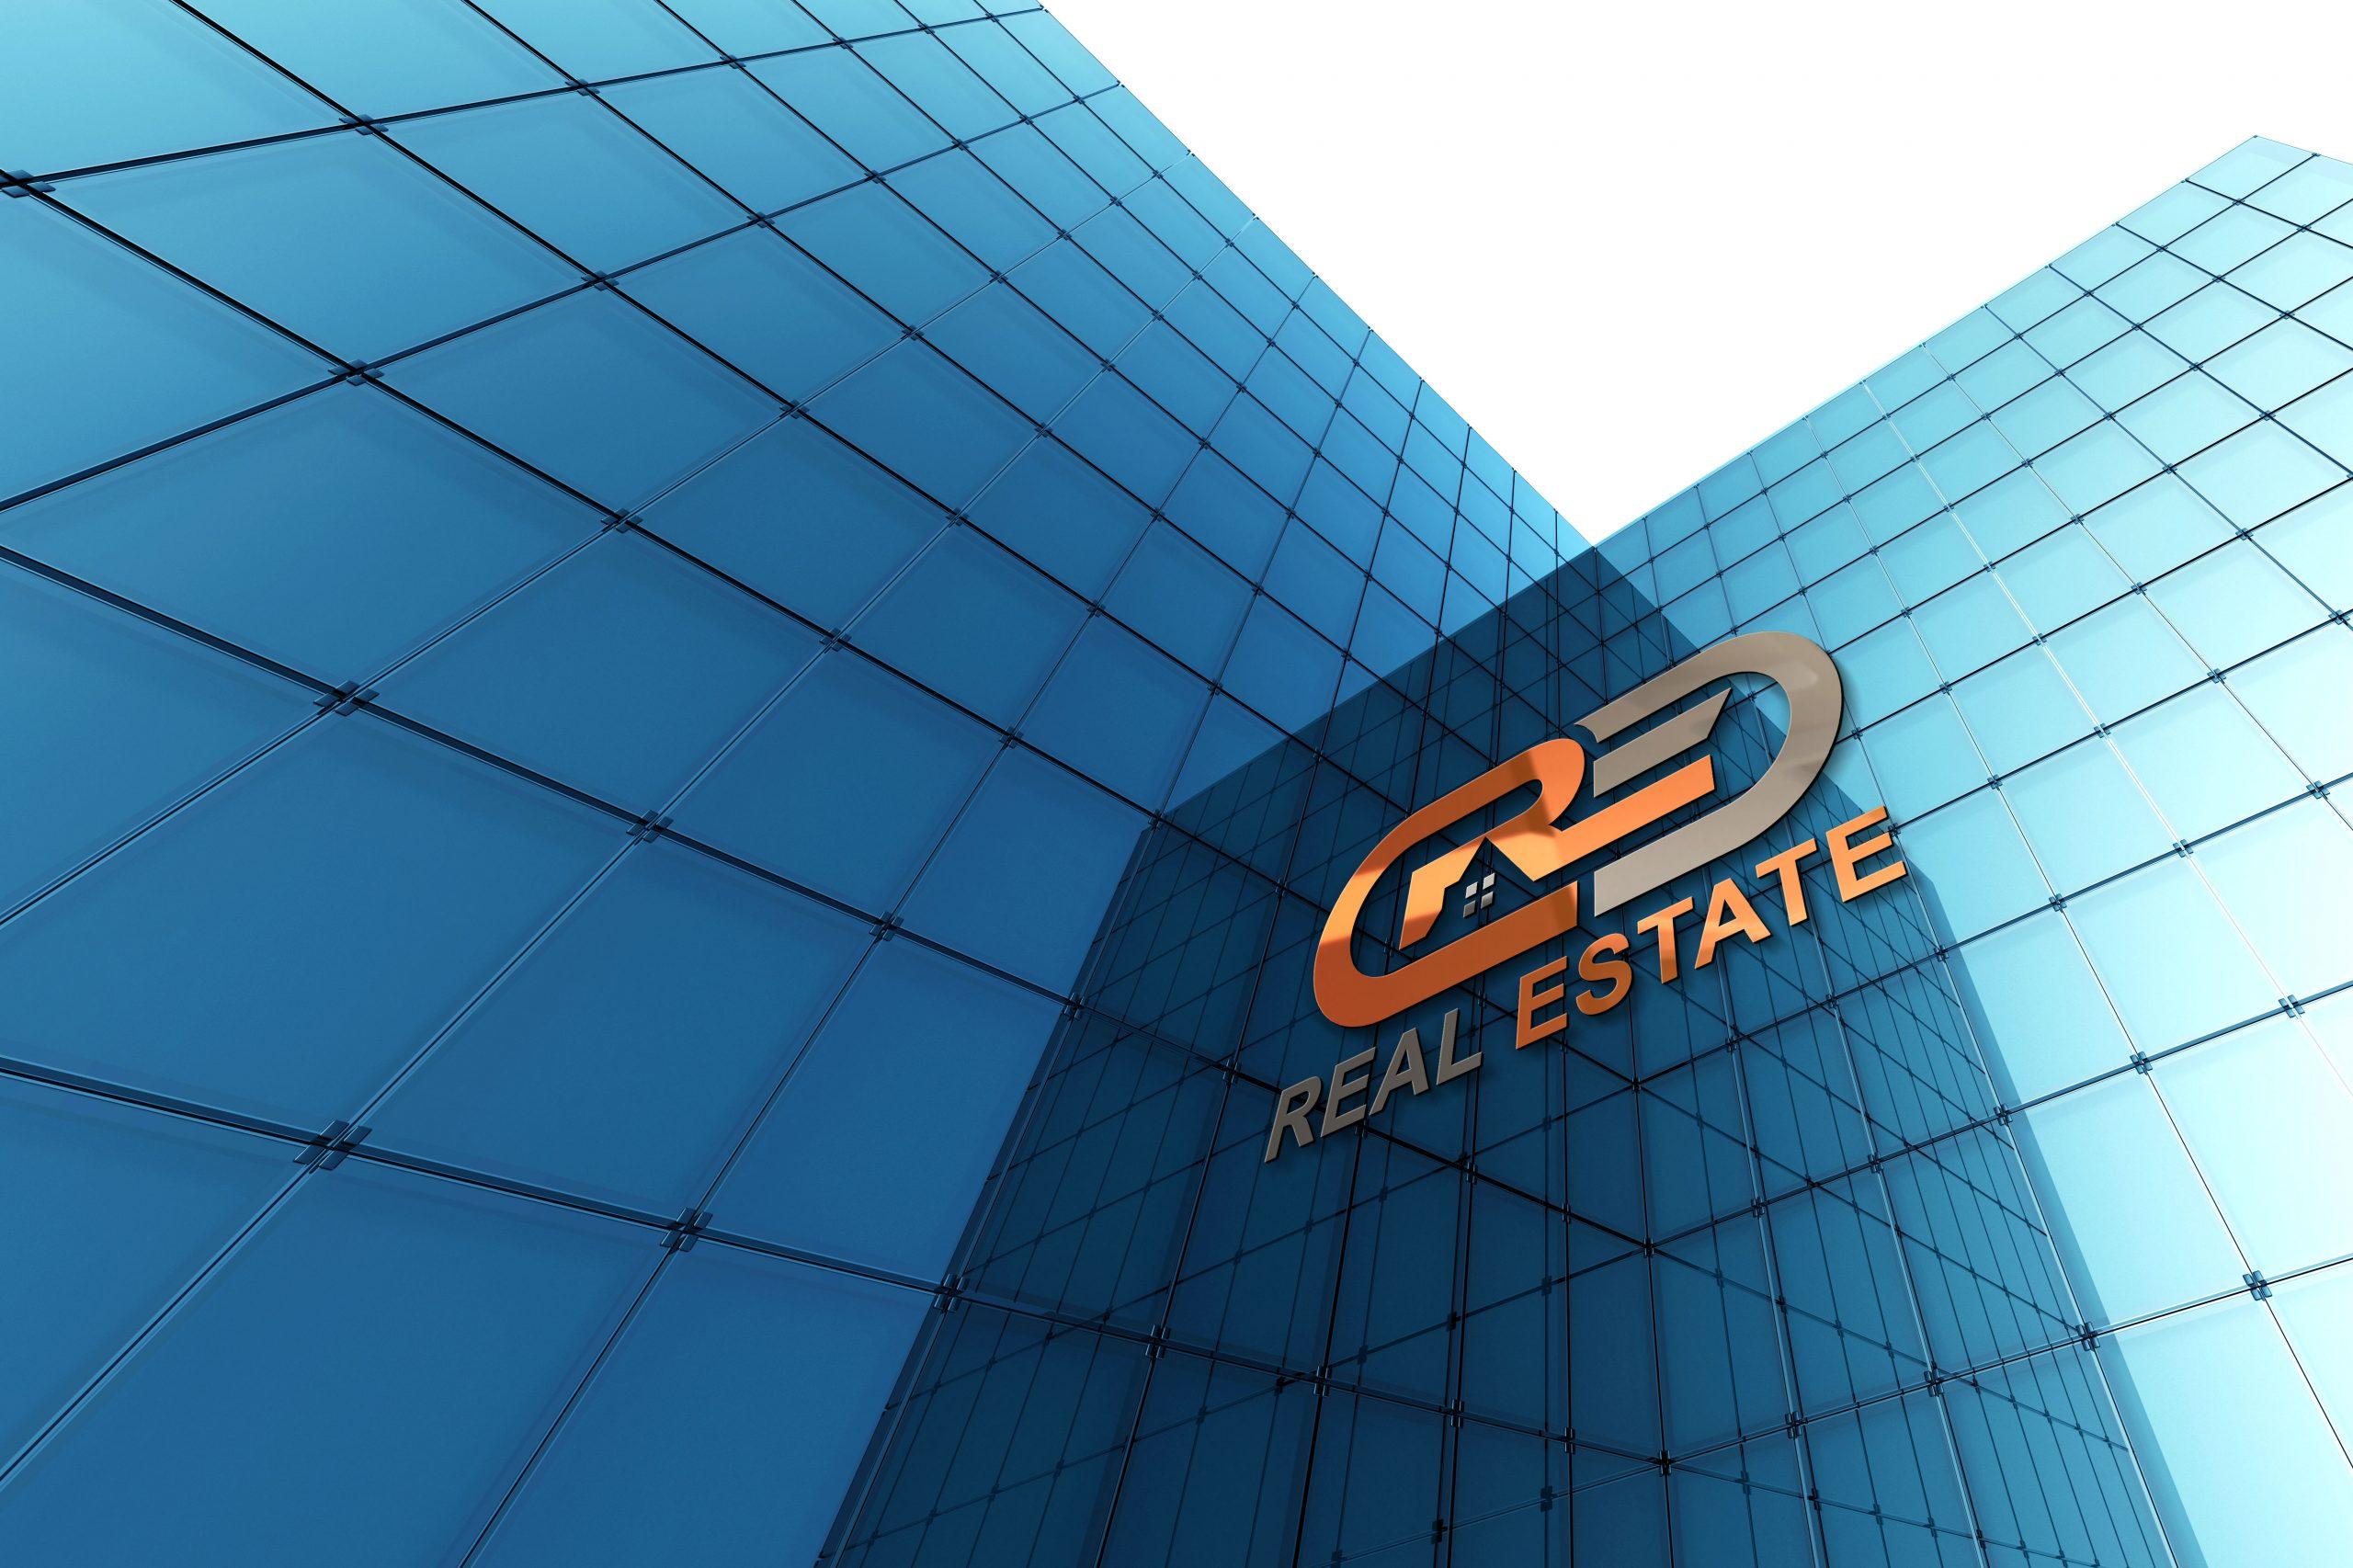 Modern Real Estate Company Logo Design PSD